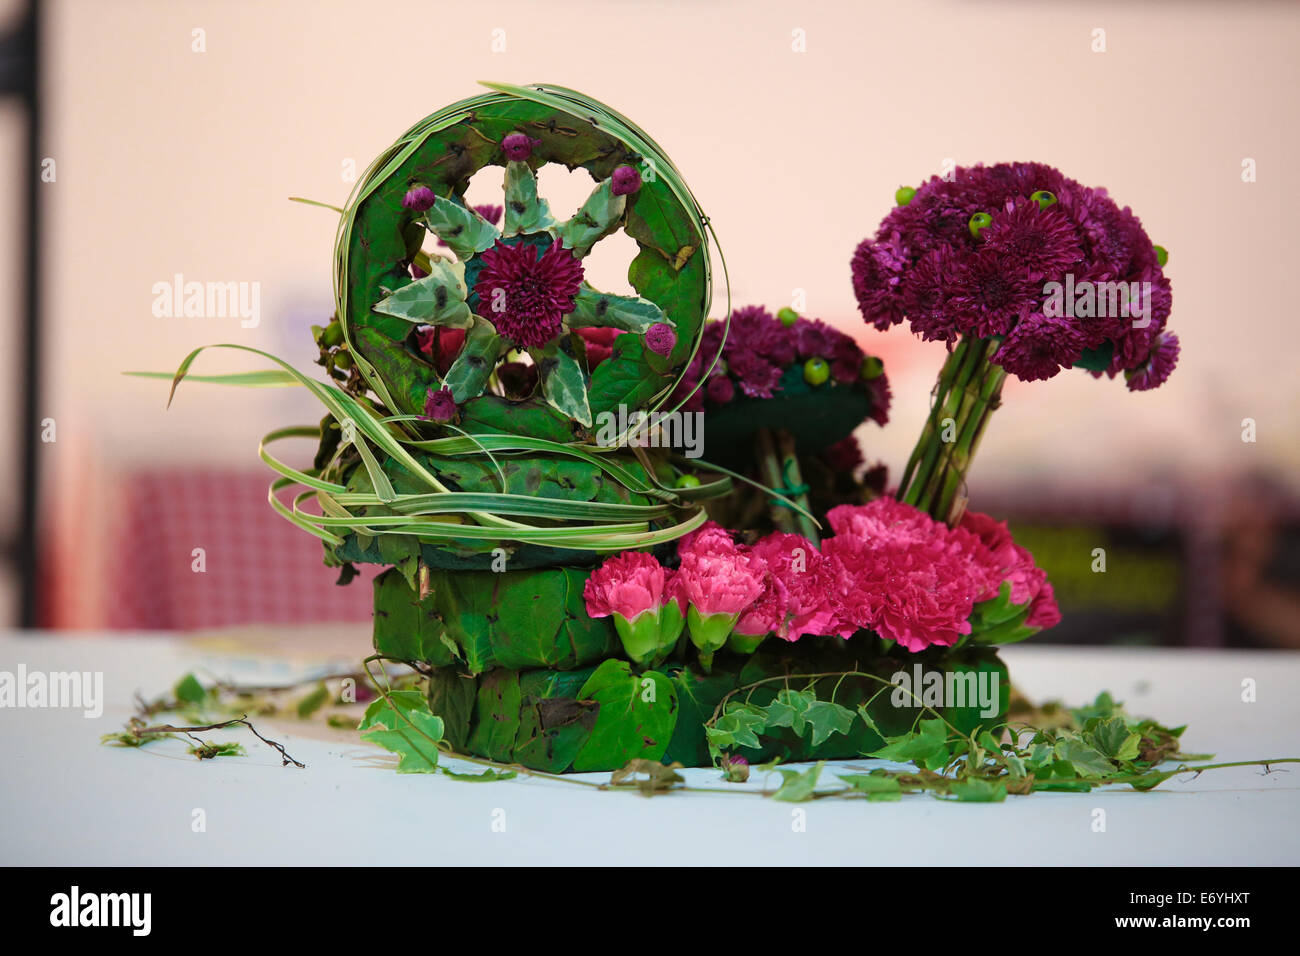 Tabletop Flower Arrangements.   Stock Image